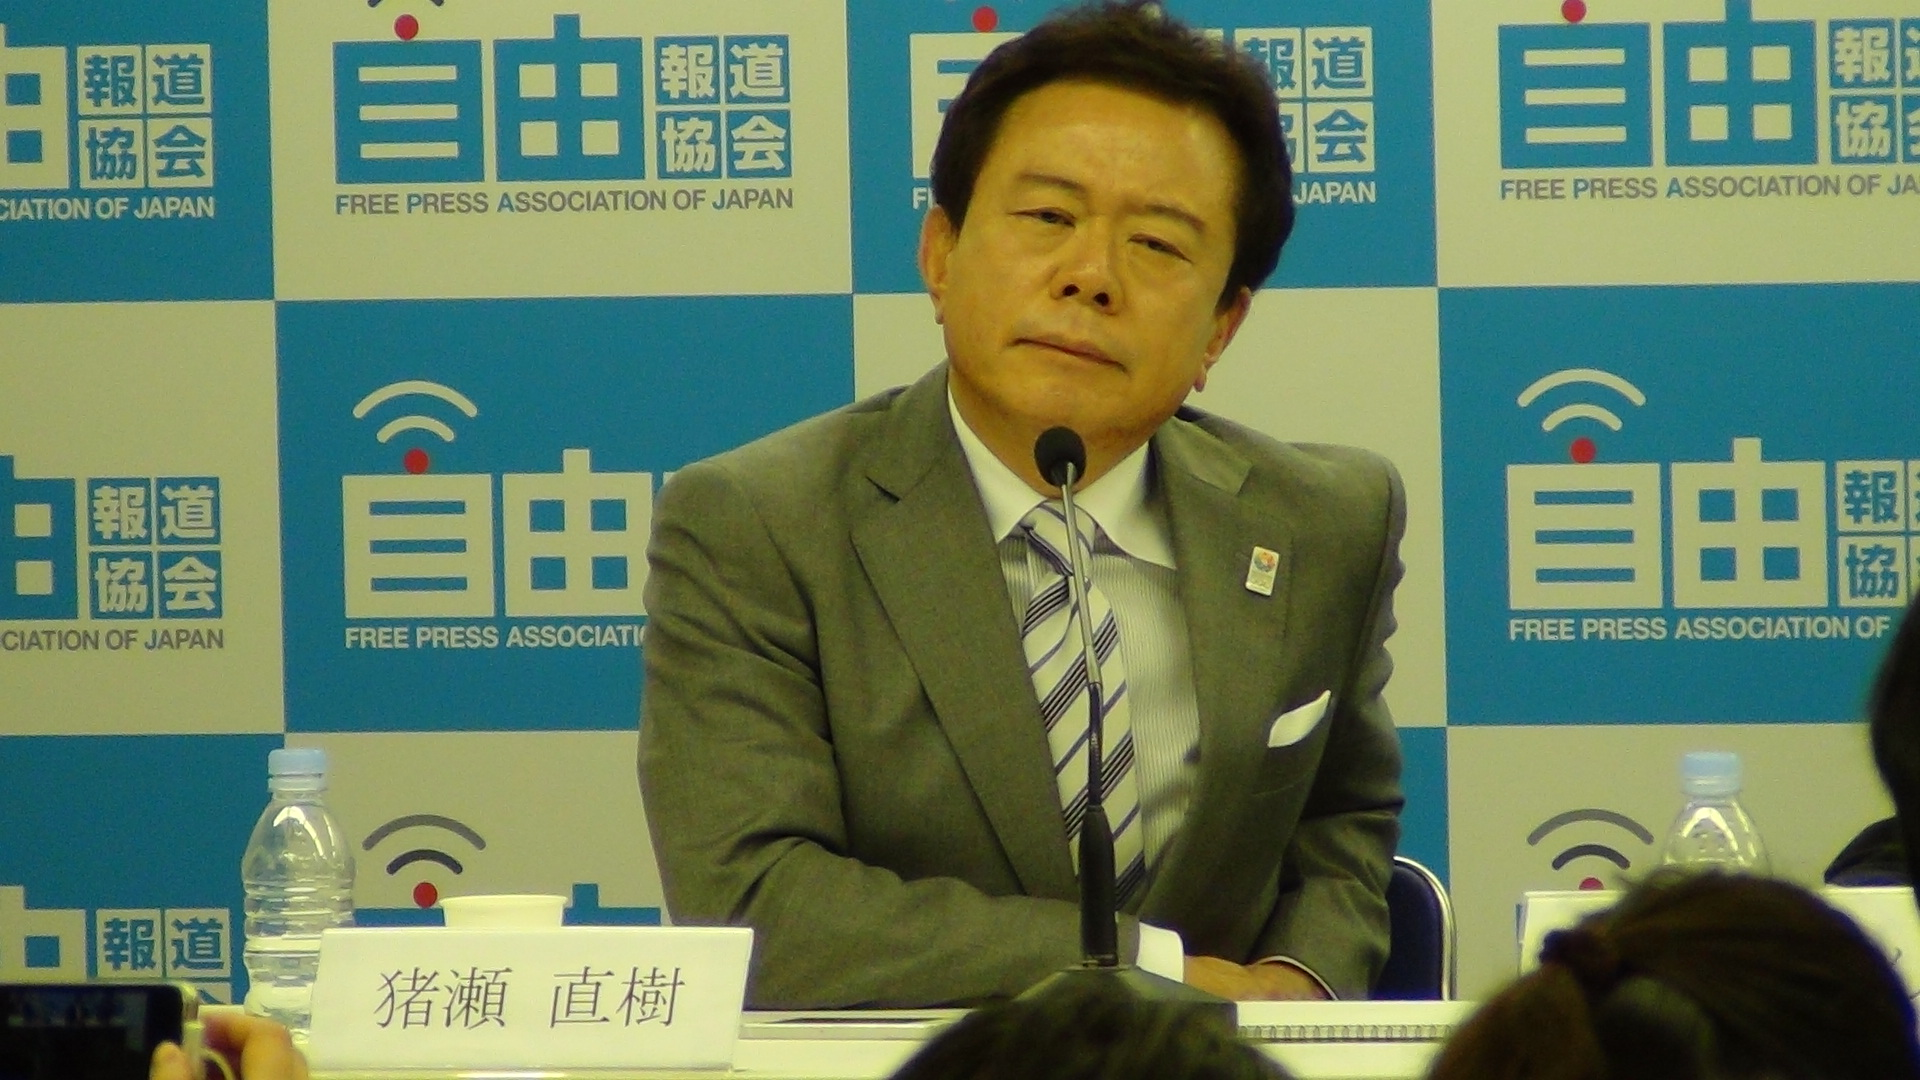 http://daily.magazine9.jp/m9/oshidori/DSC01134%5B1%5D.JPG